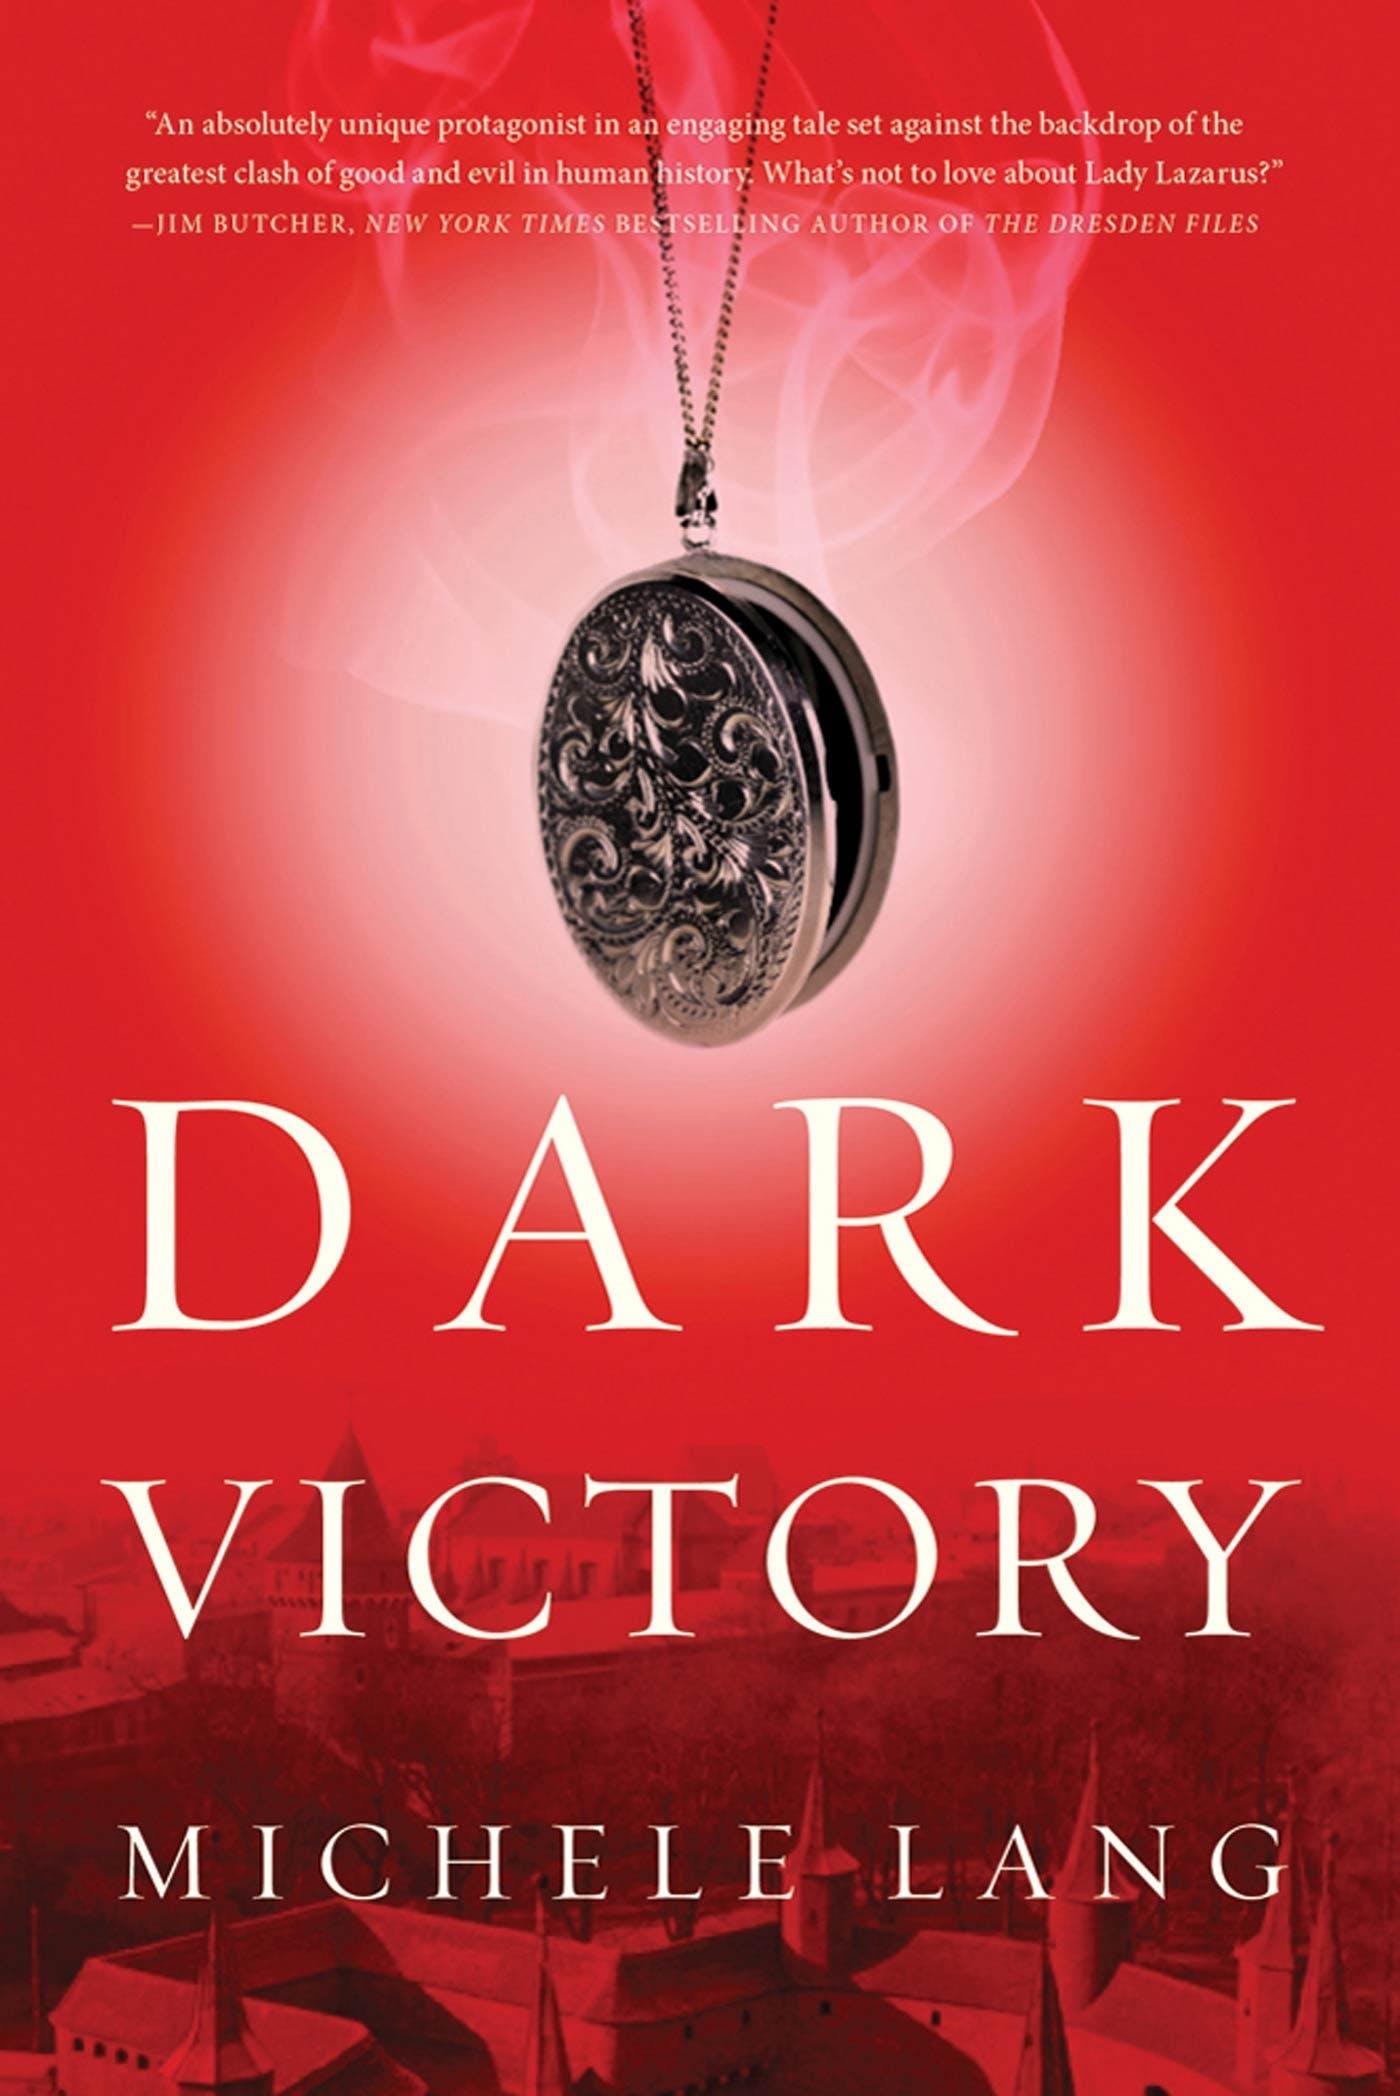 Image of Dark Victory